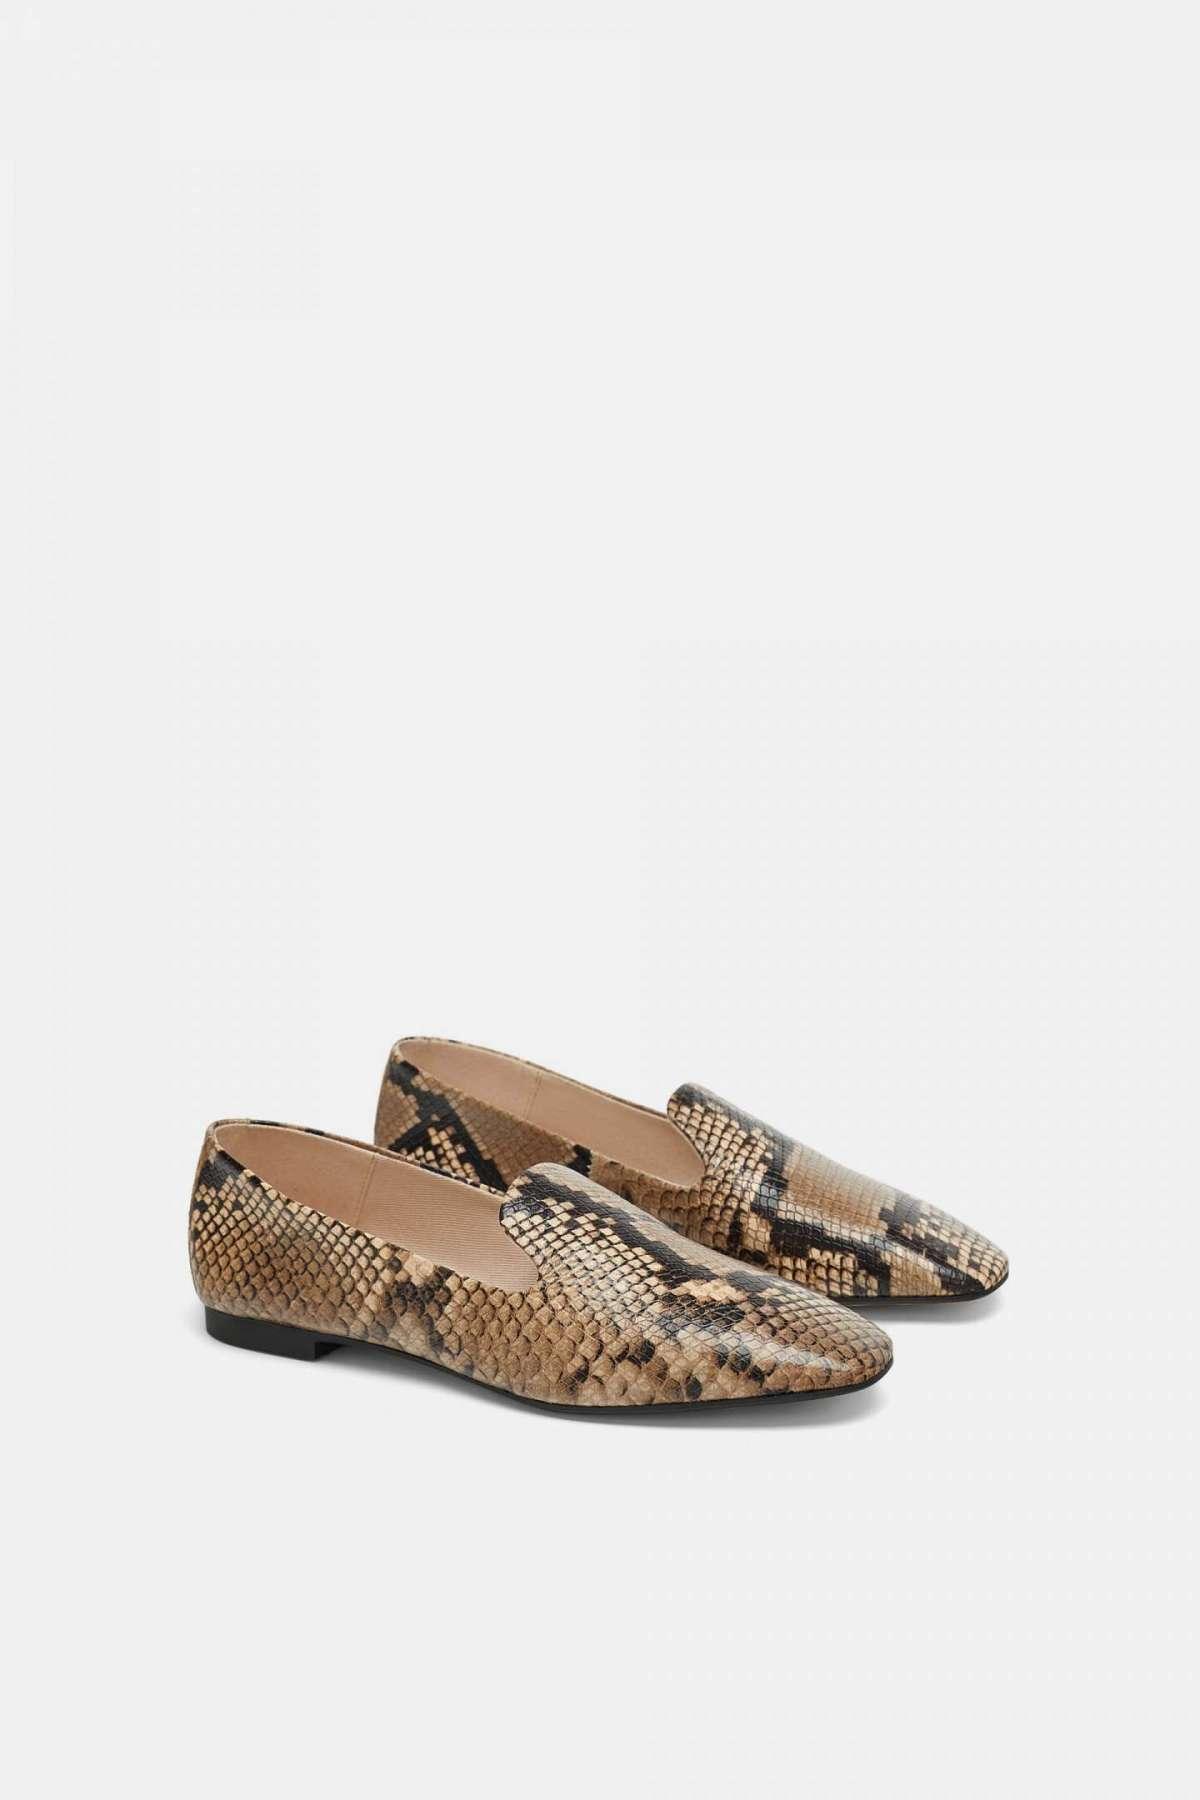 Mocassini animalier Zara a 55,95 euro